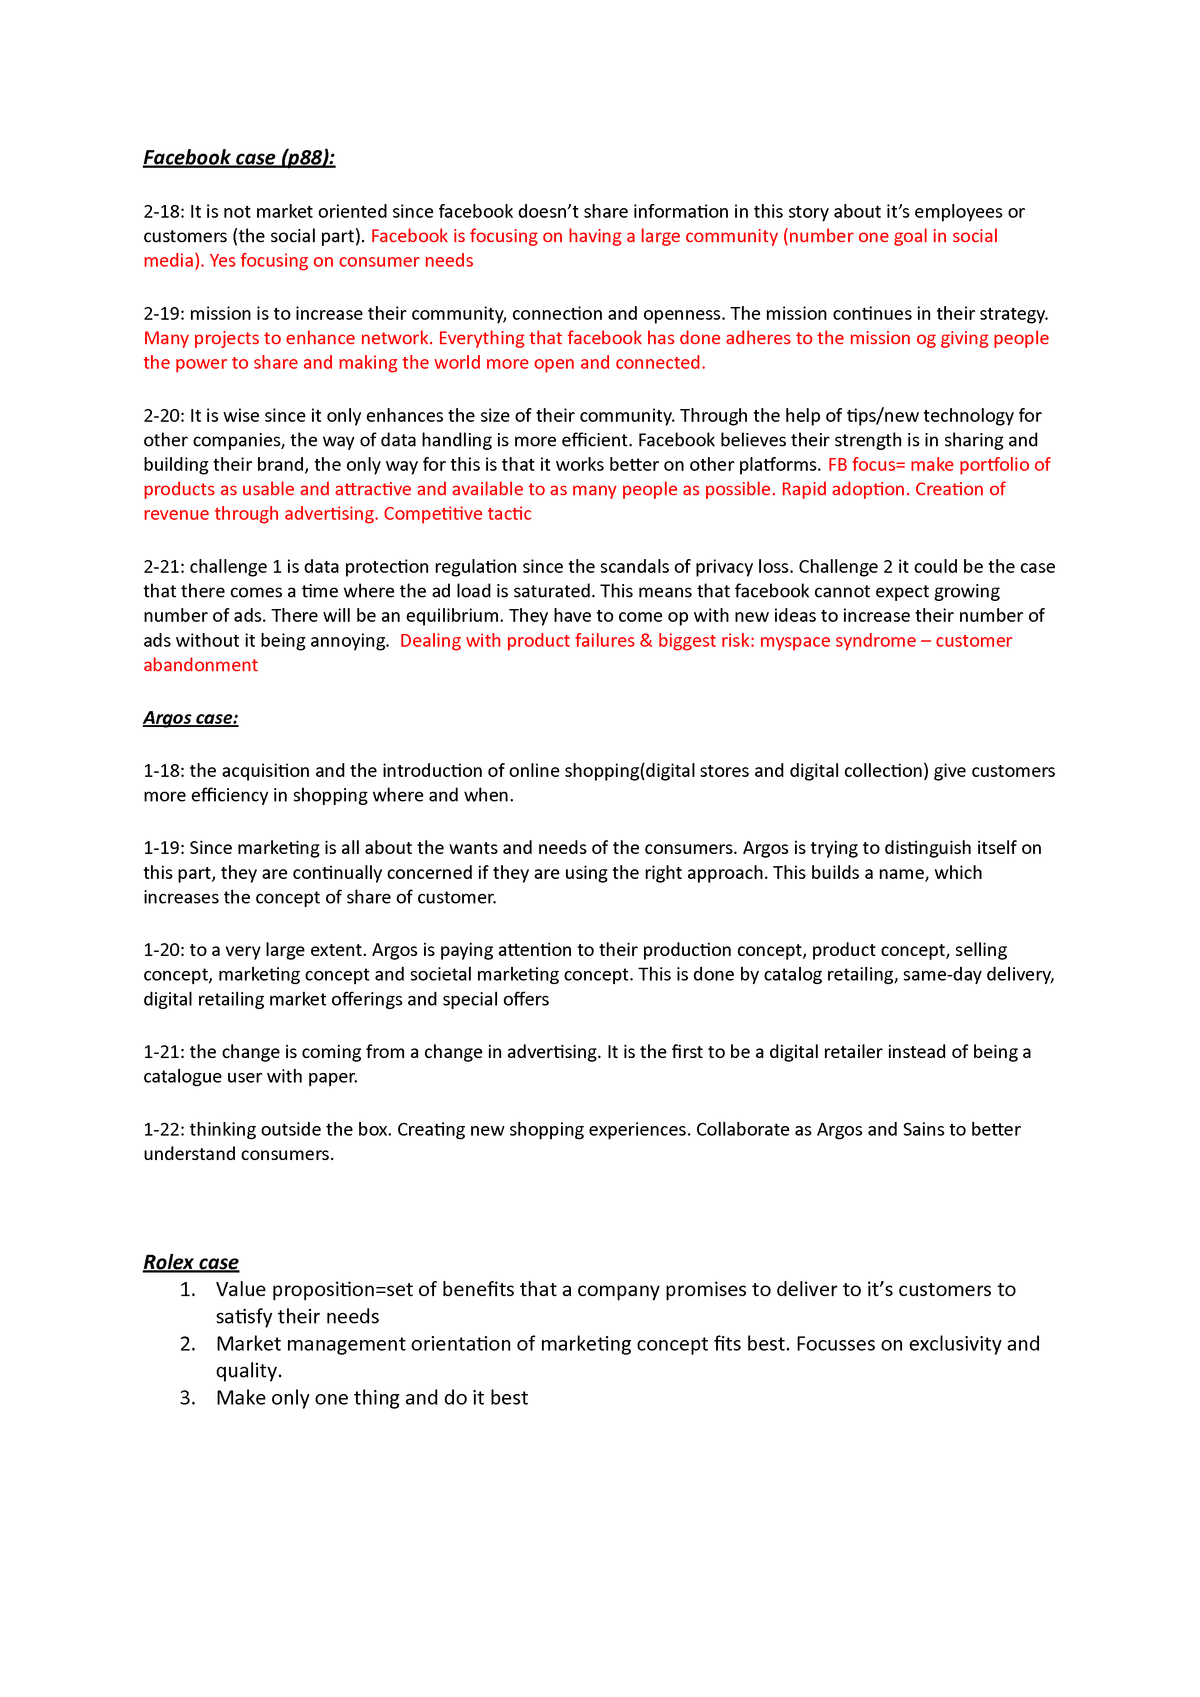 Facebook case + Argos case week 1 - ECB2MKT: Marketing - StuDocu